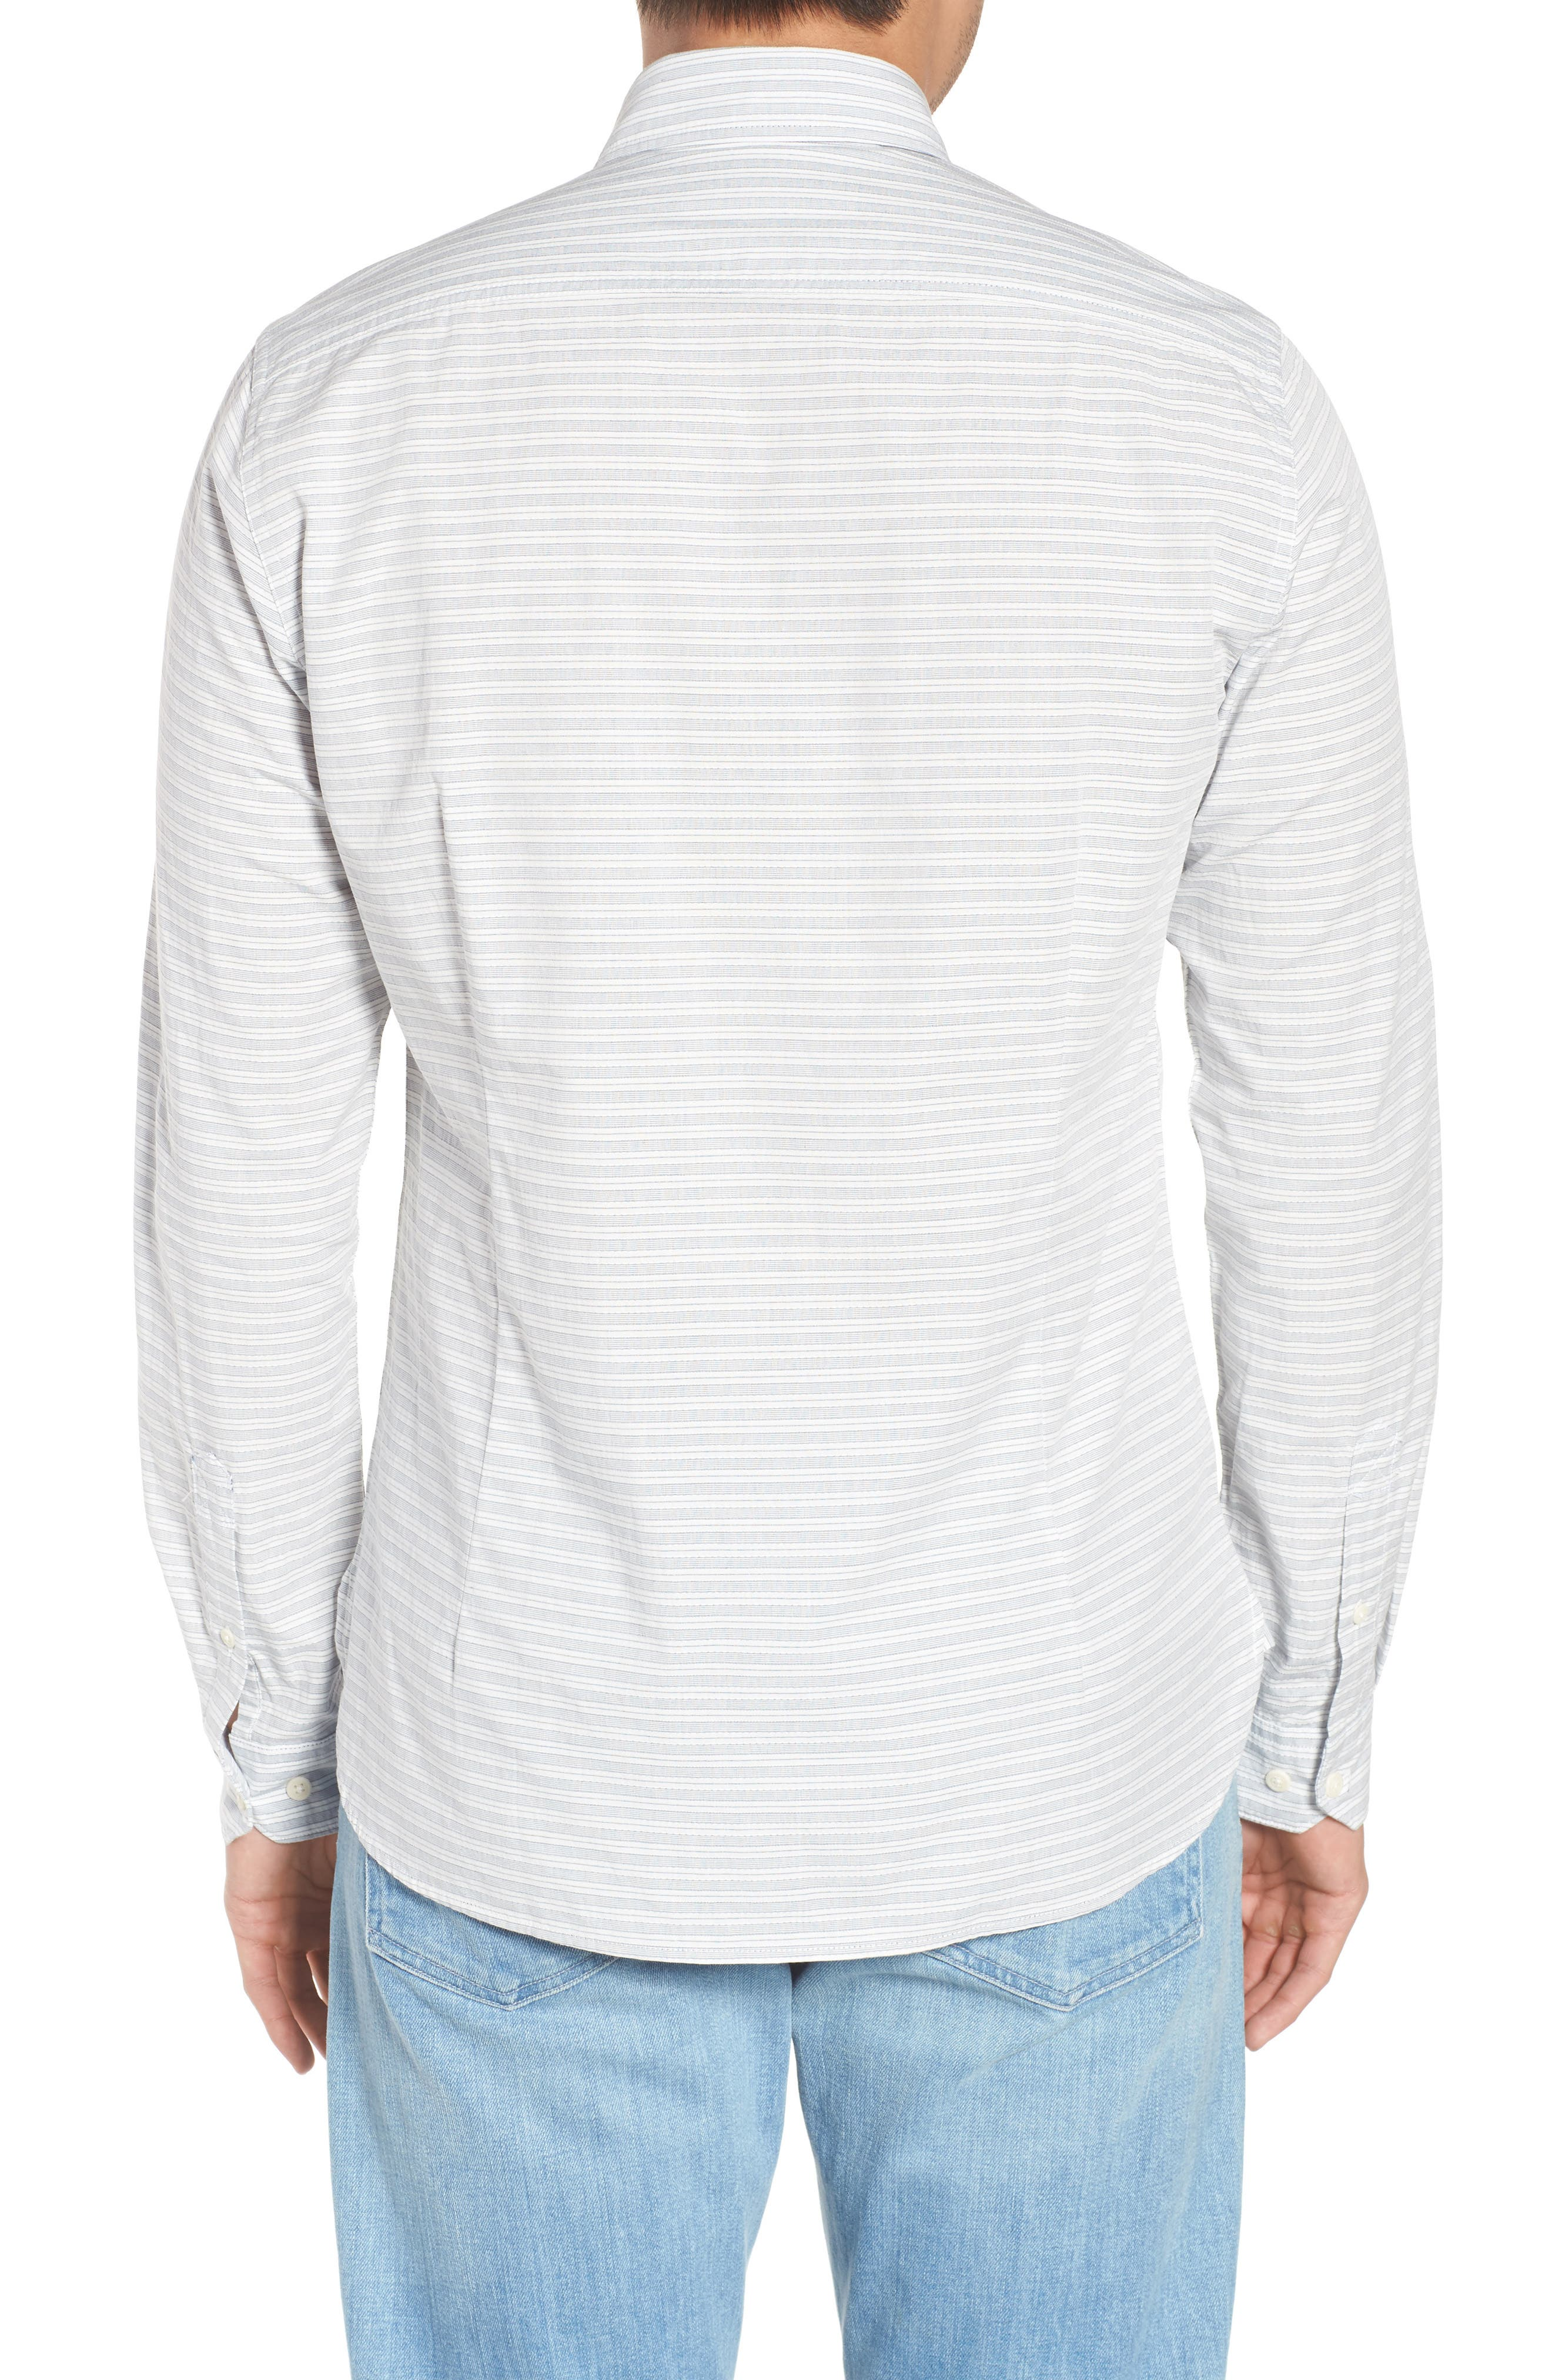 Huchen Regular Fit Stripe Sport Shirt,                             Alternate thumbnail 2, color,                             White